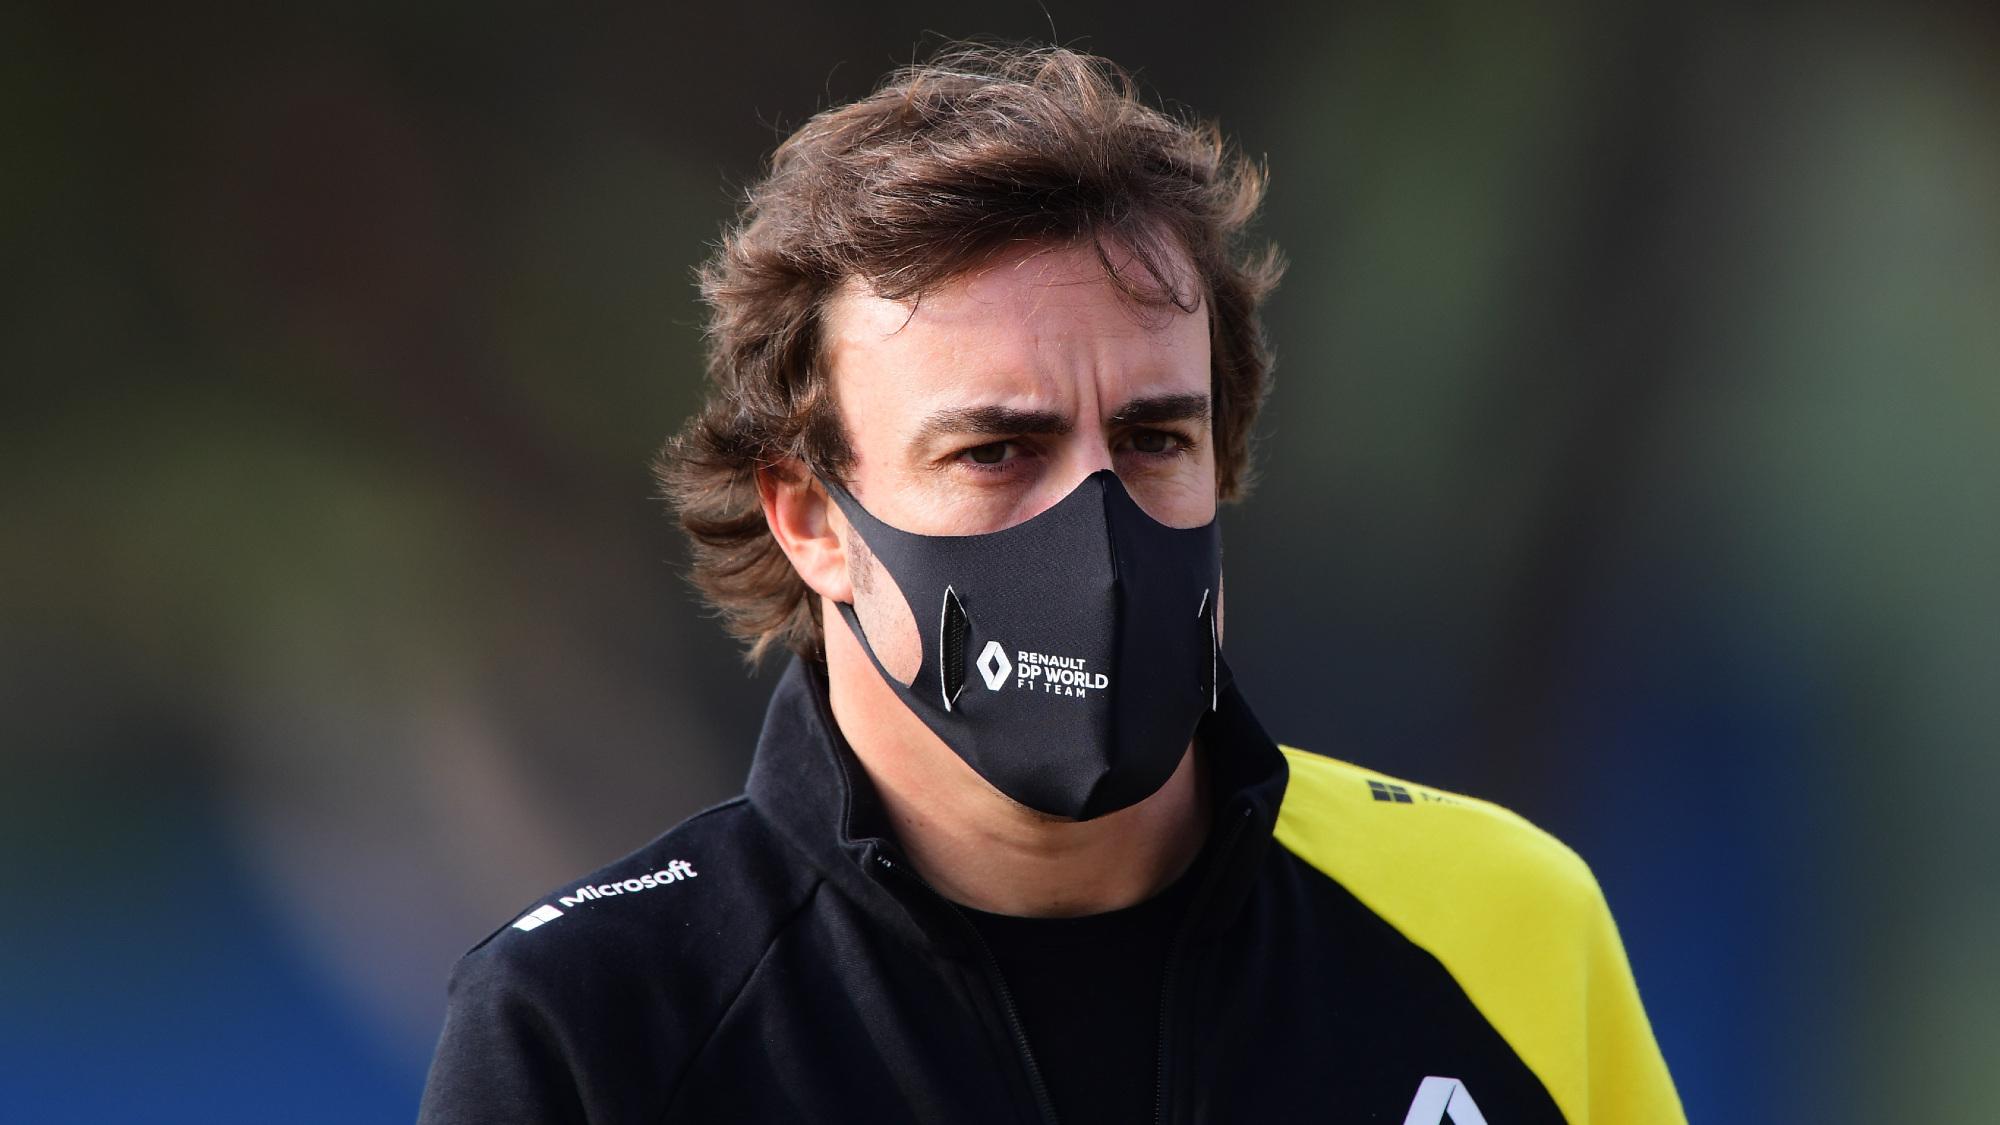 Fernando Alonos, Renault F1 2020